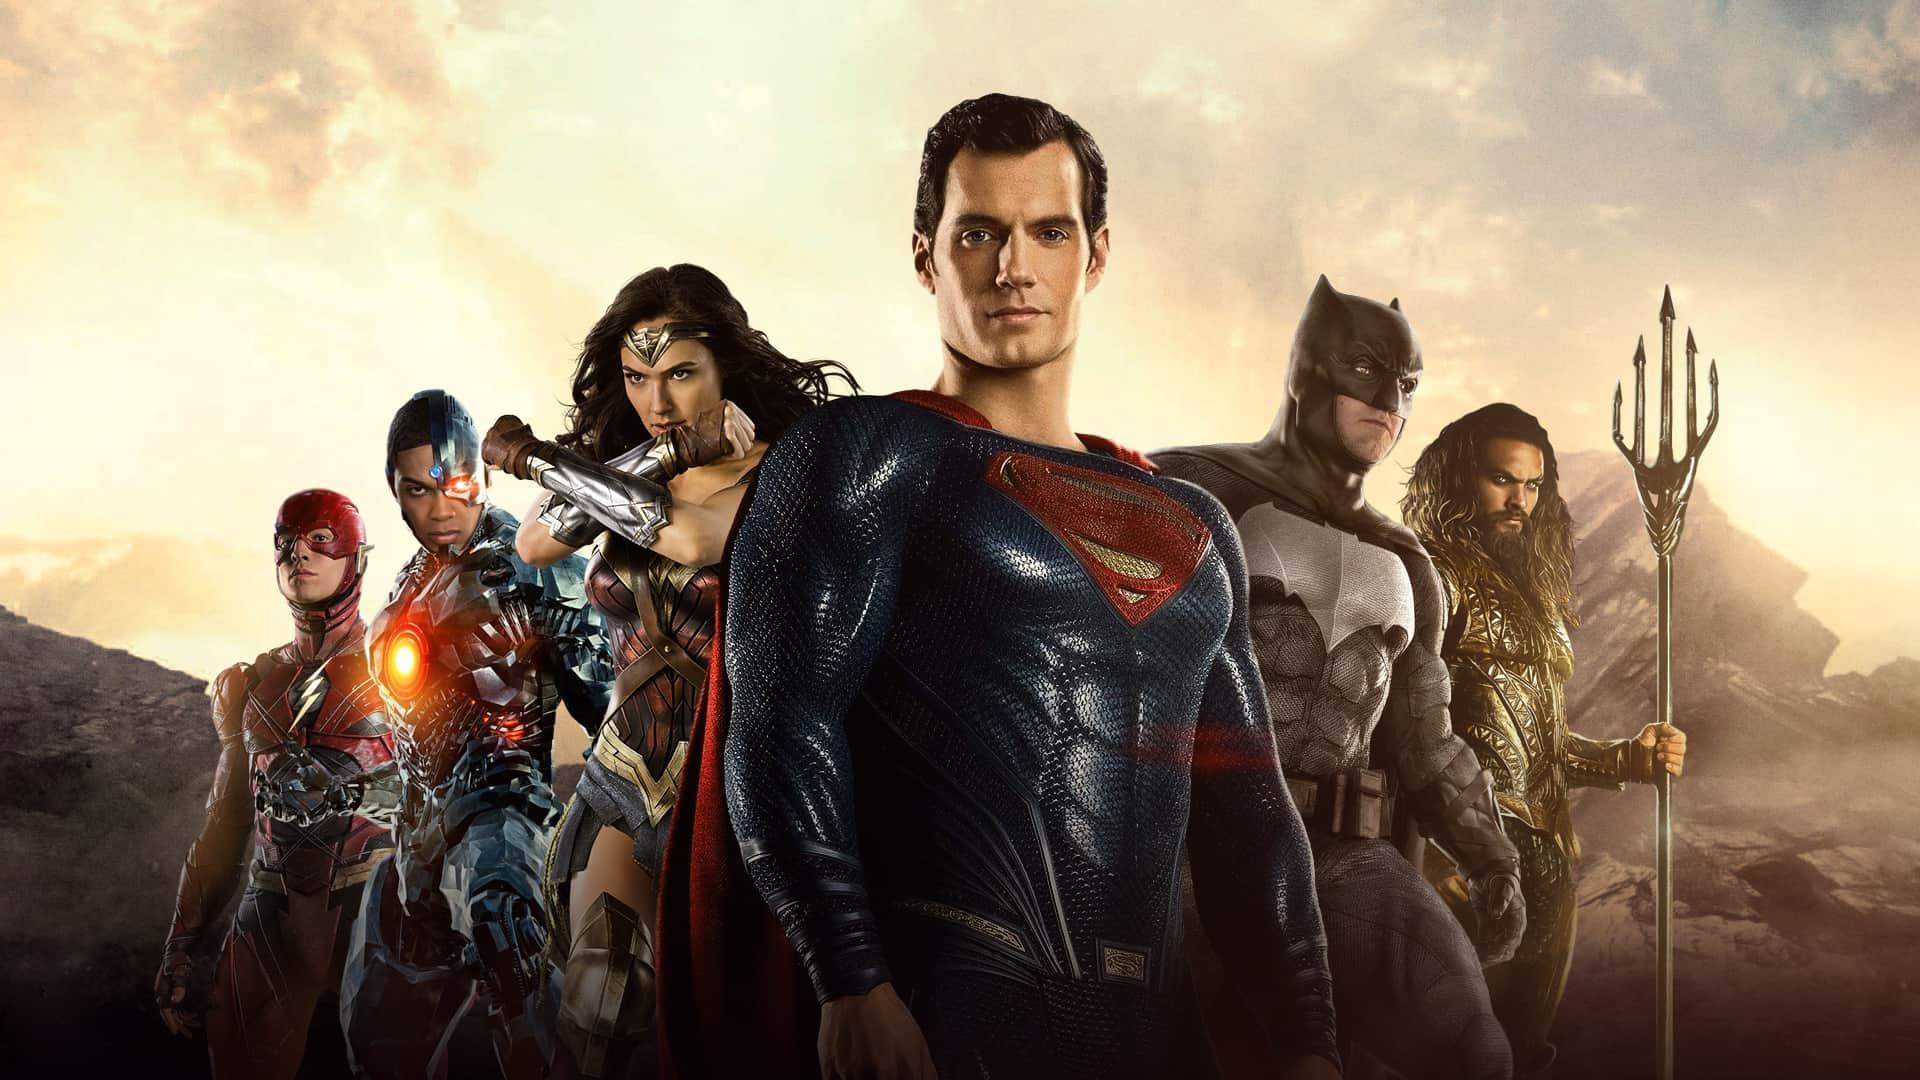 Warner Underestimates Demand of Zack Snyder's Justice League